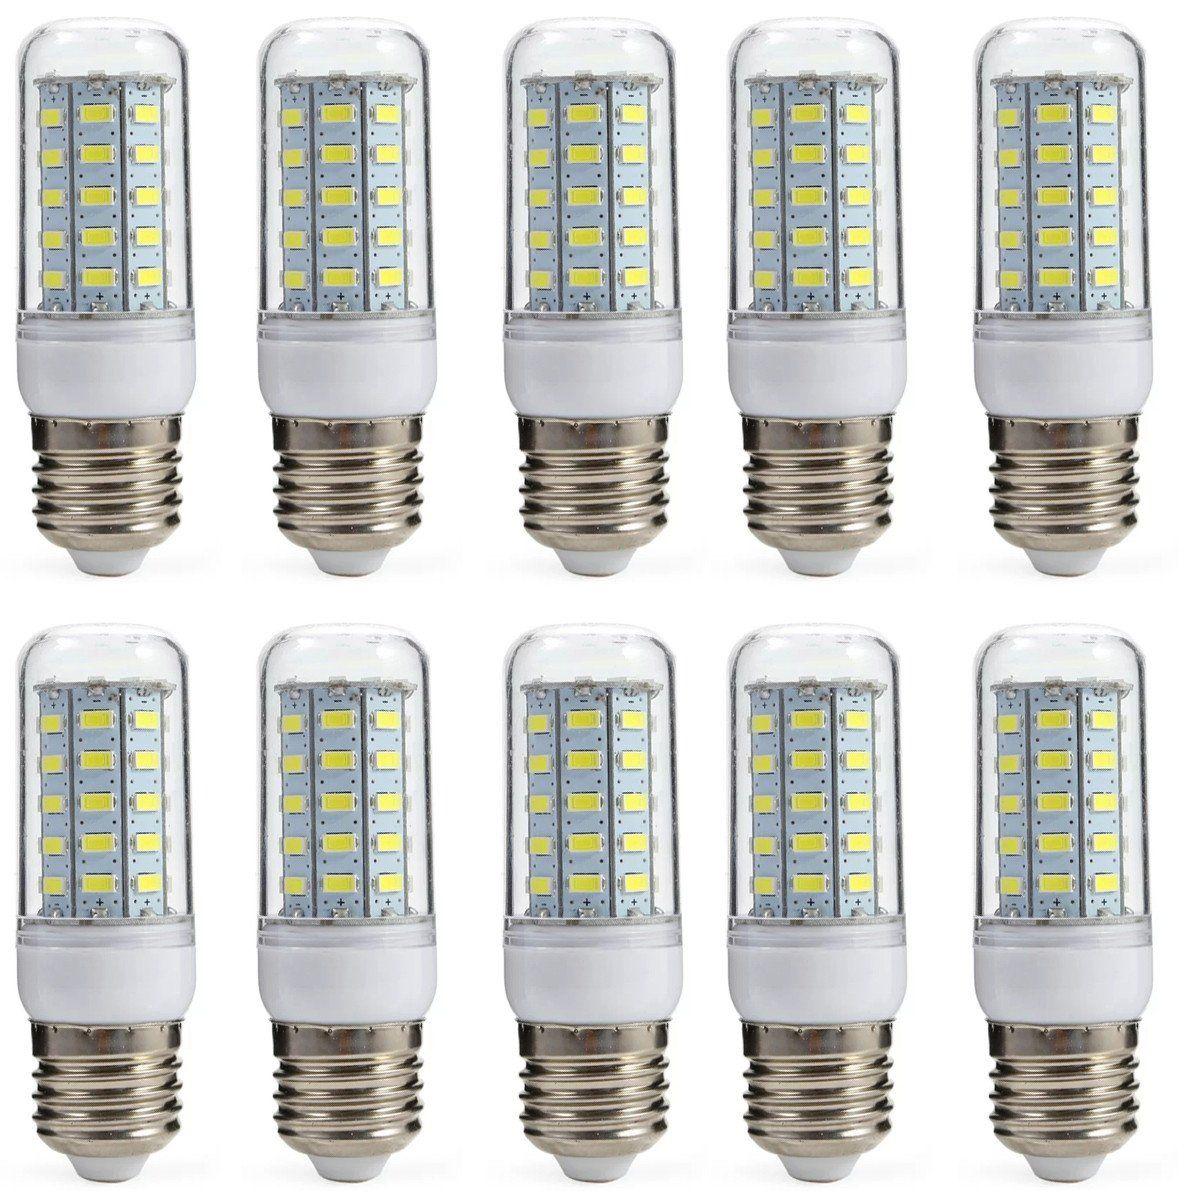 Aoxdi 10x E27 Led Lampe Leuchtmittel 7w Kaltwei 48 Smd 5730 Energiesparlampe E27 Led Birne Gl Hbirne Ac220 240v In 2020 Led Birnen Leuchtmittel Led Lampe